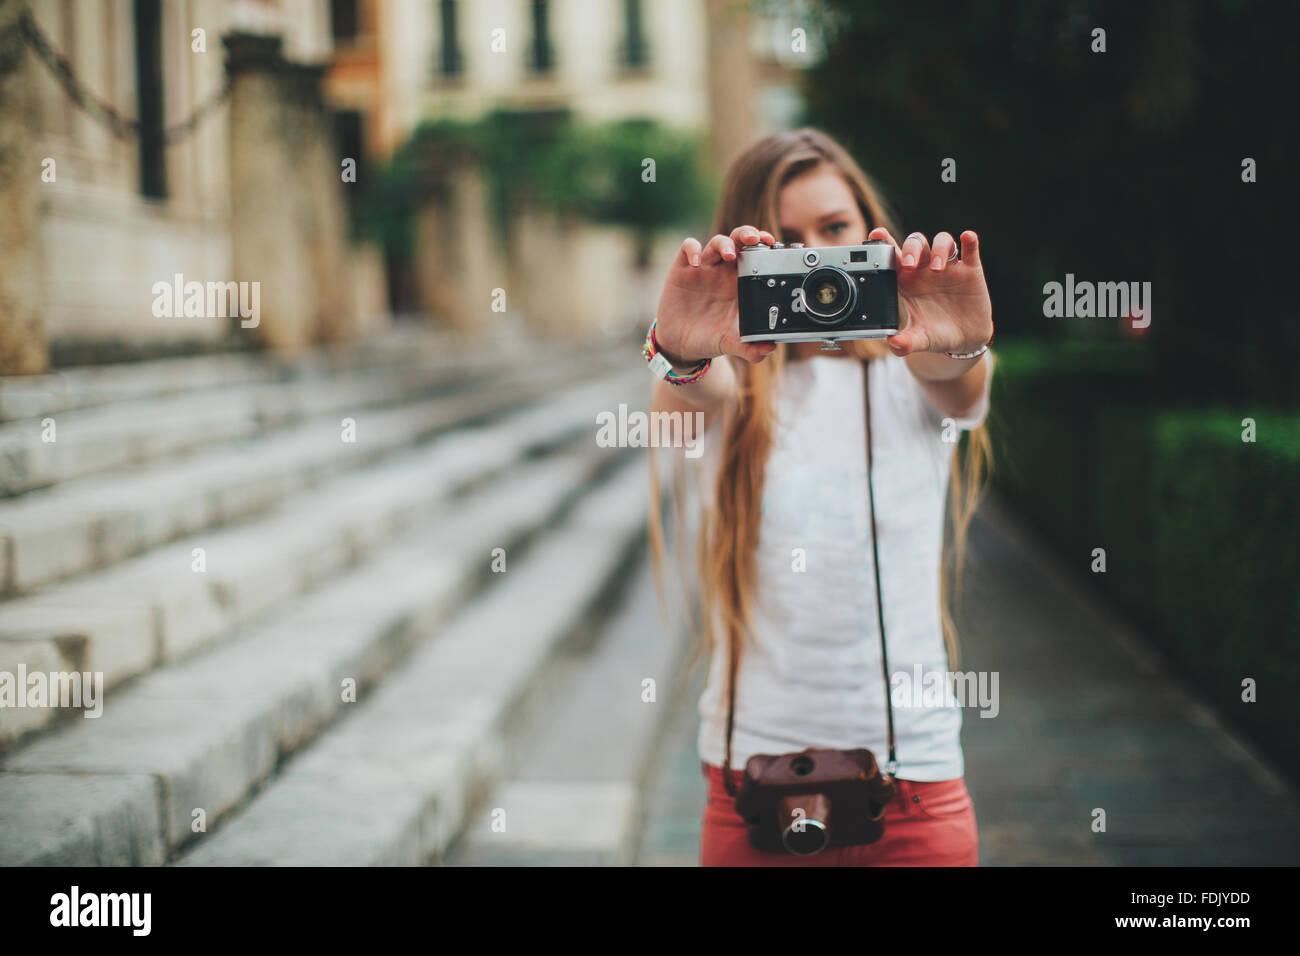 Young woman holding film retro camera, Séville, Espagne Photo Stock